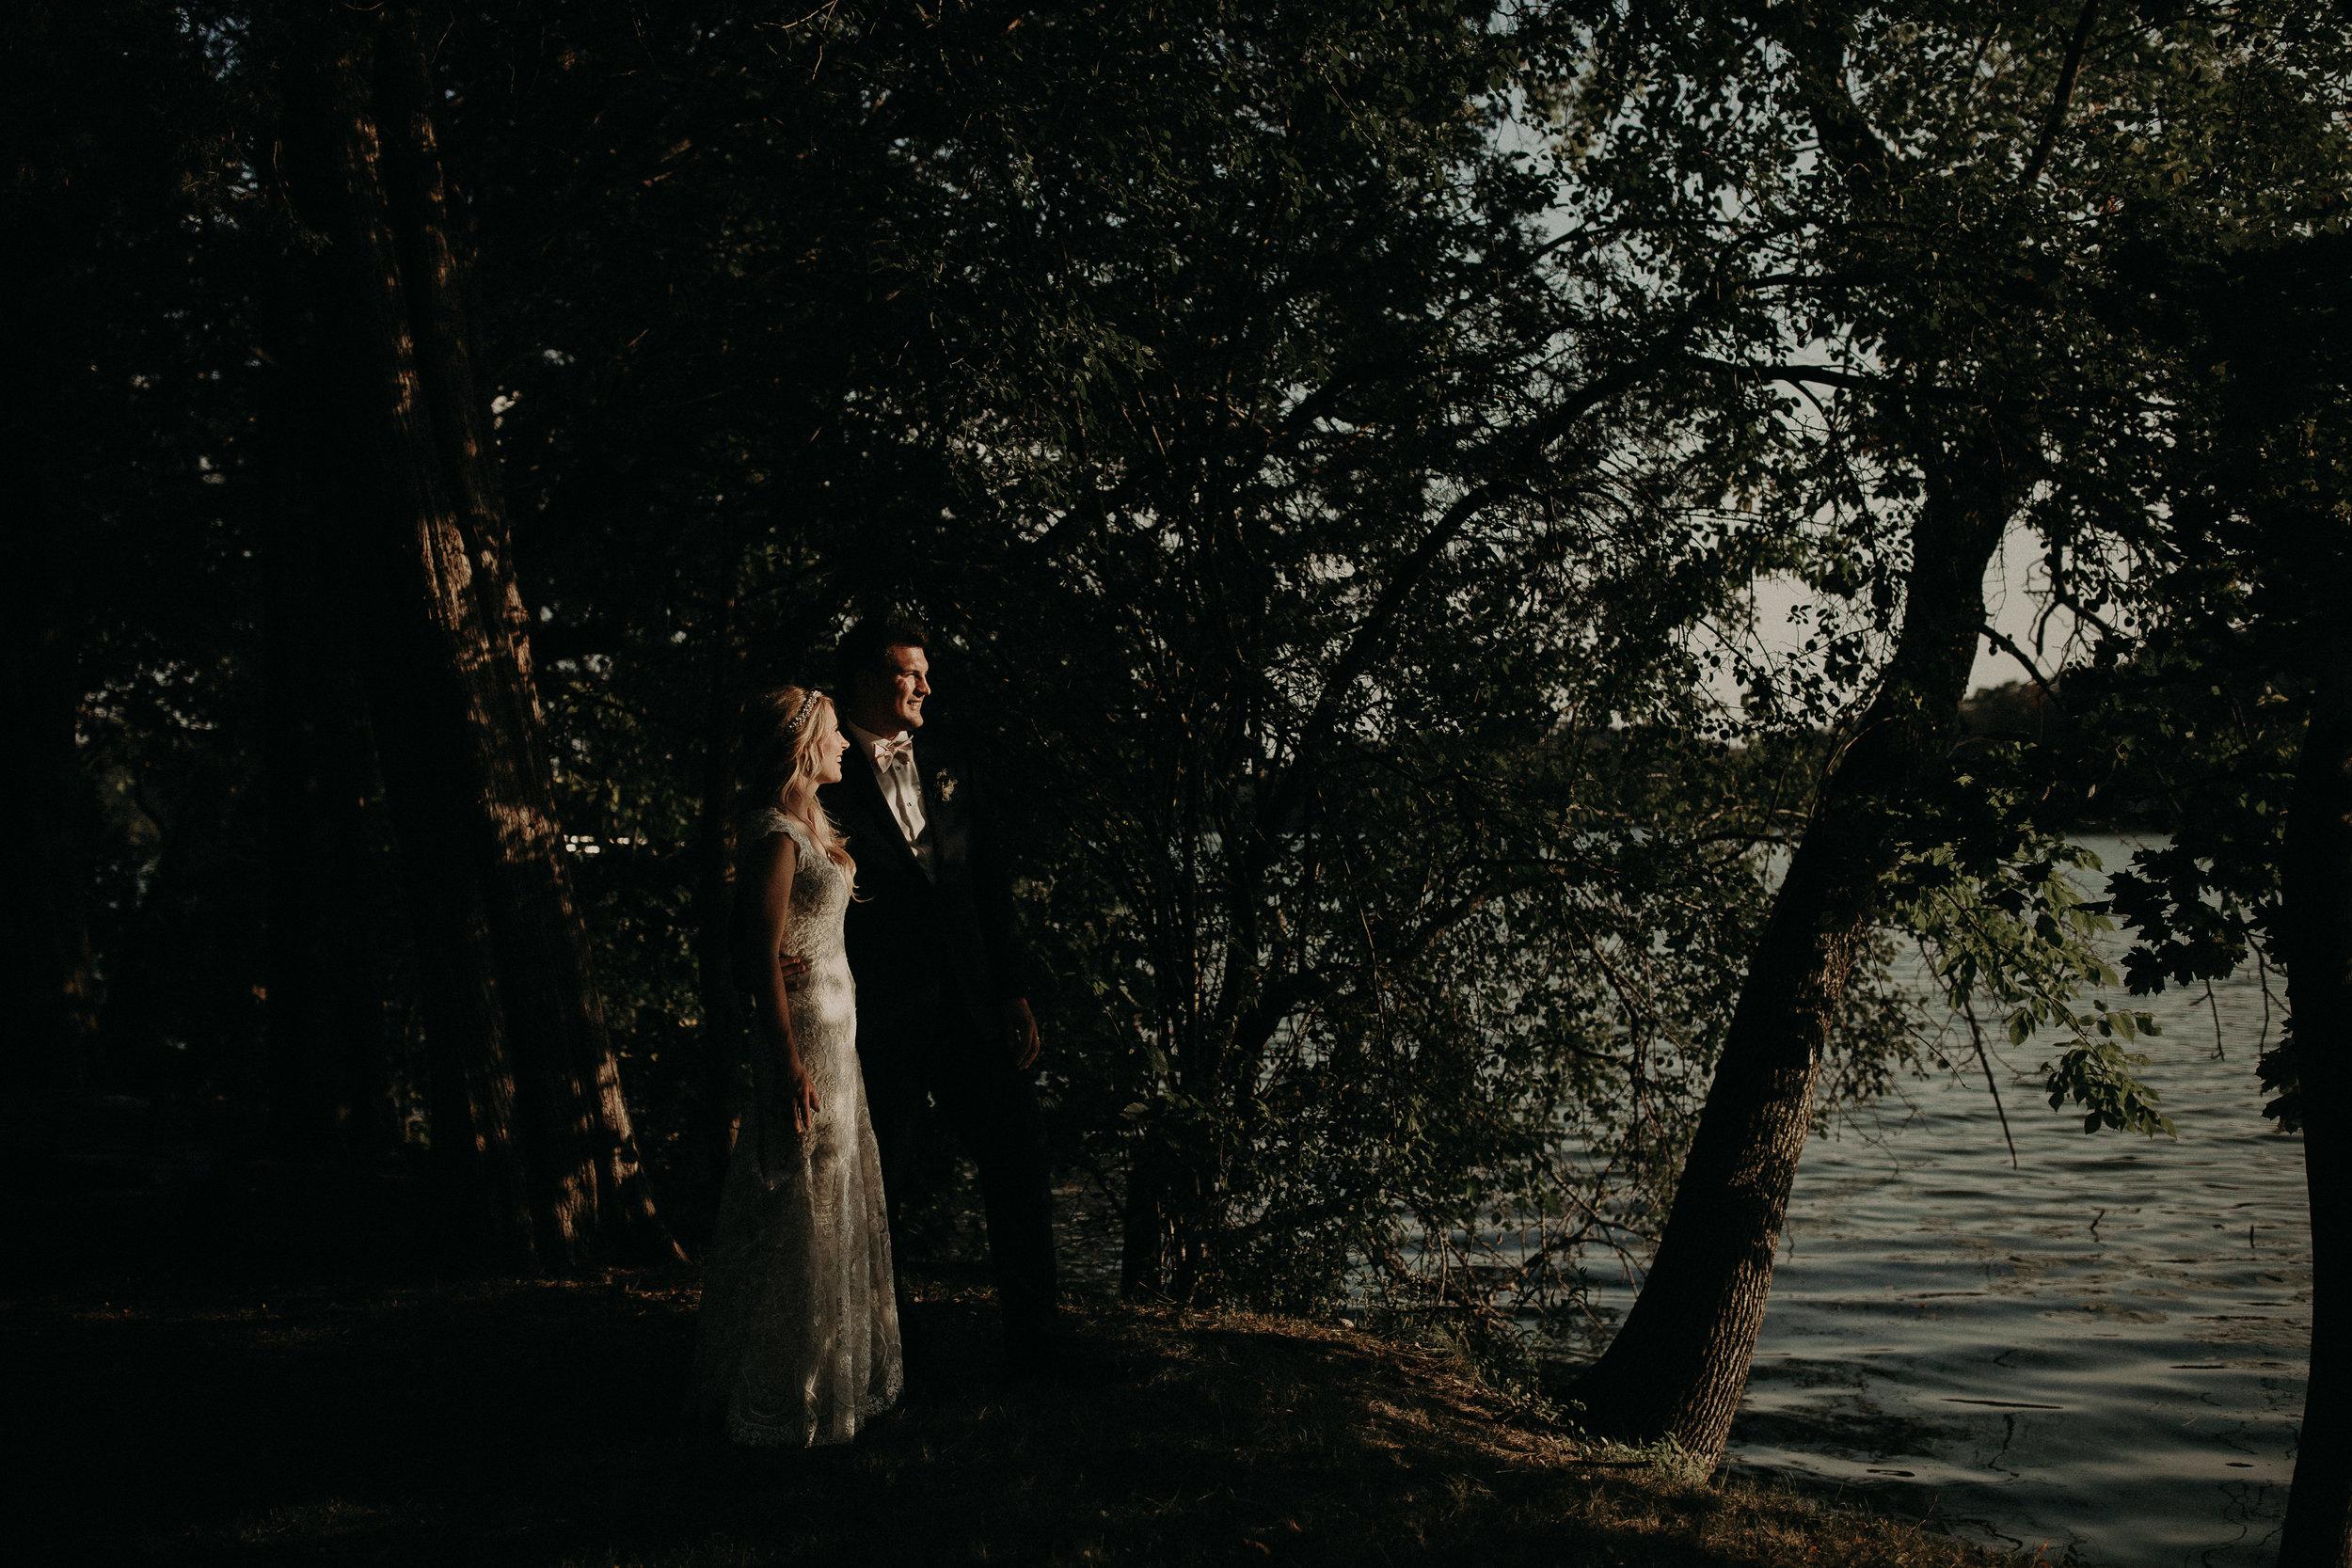 Lake_Oconomowoc_Wisconsin_Wedding_Kata_Dan-EDIT-622.JPG